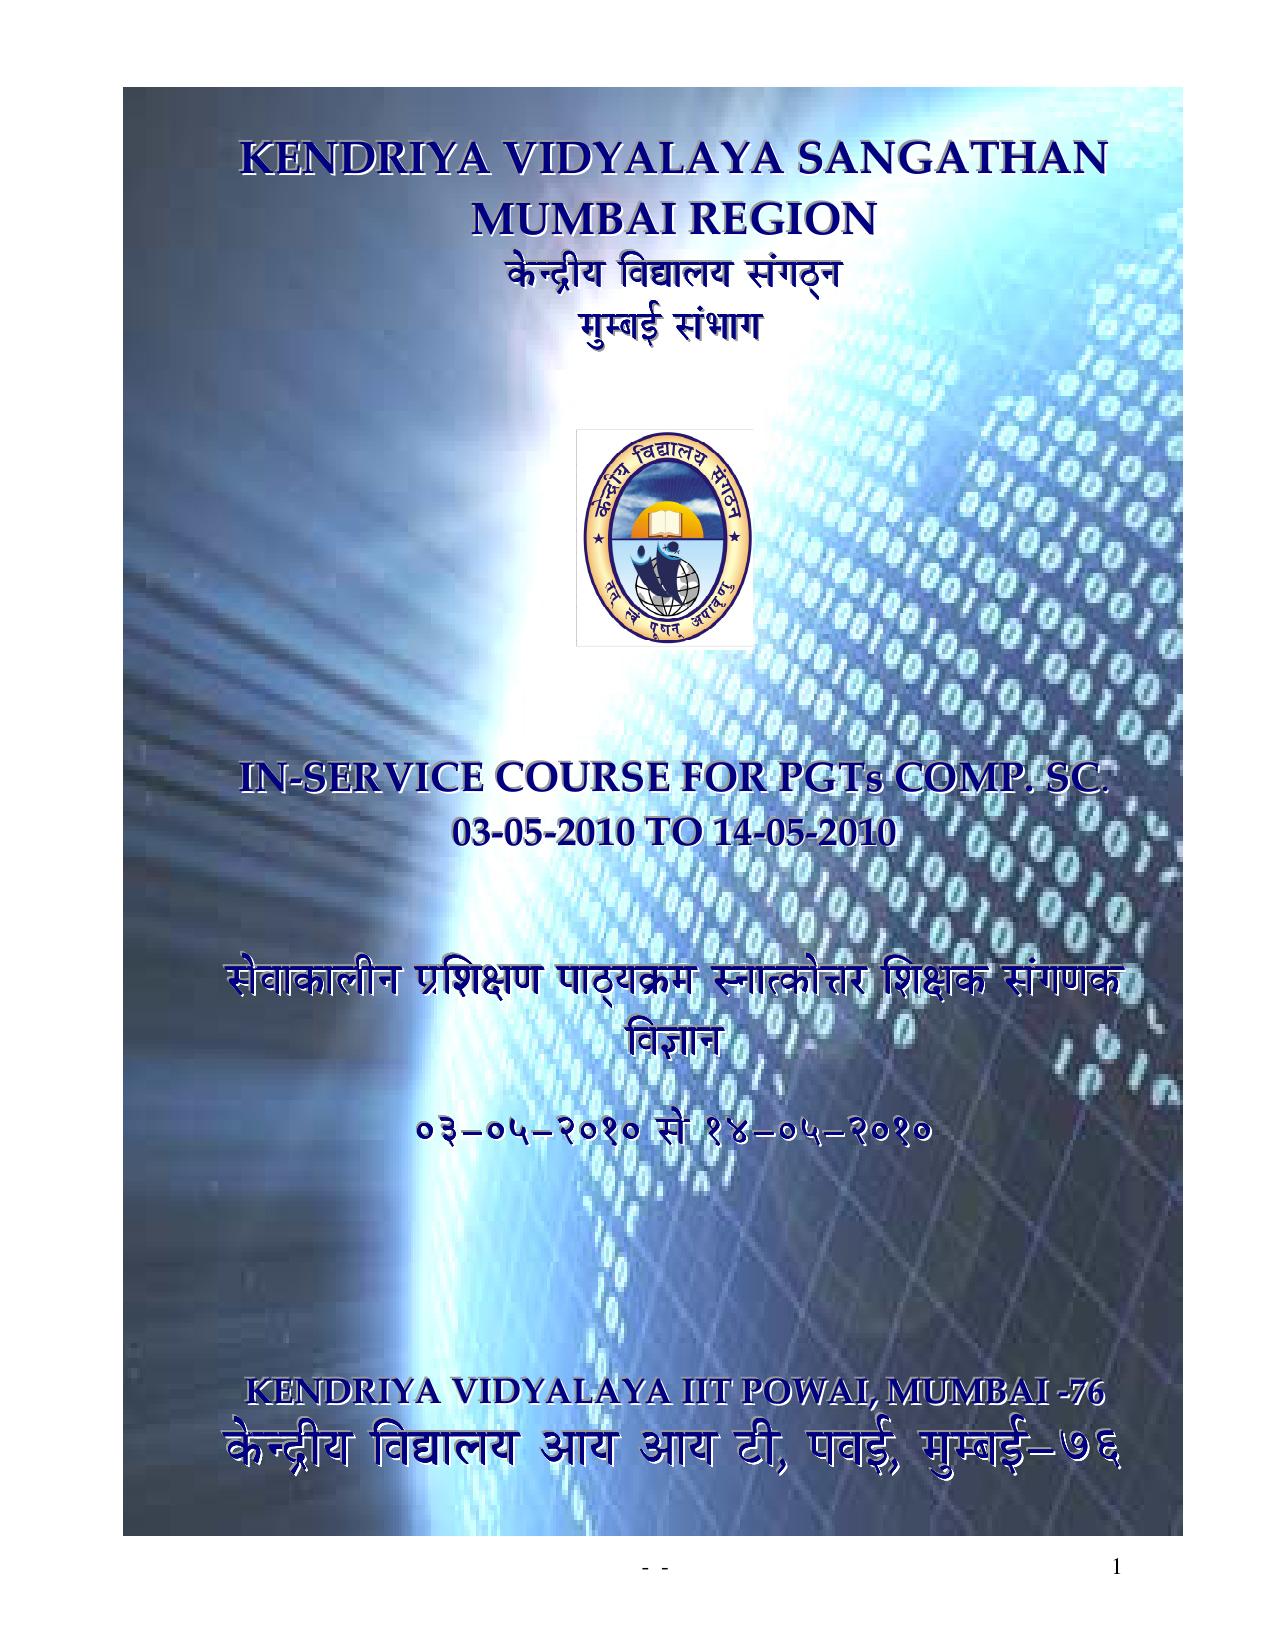 Inservice Course Booklet 2010 Mumbai Region | manualzz.com